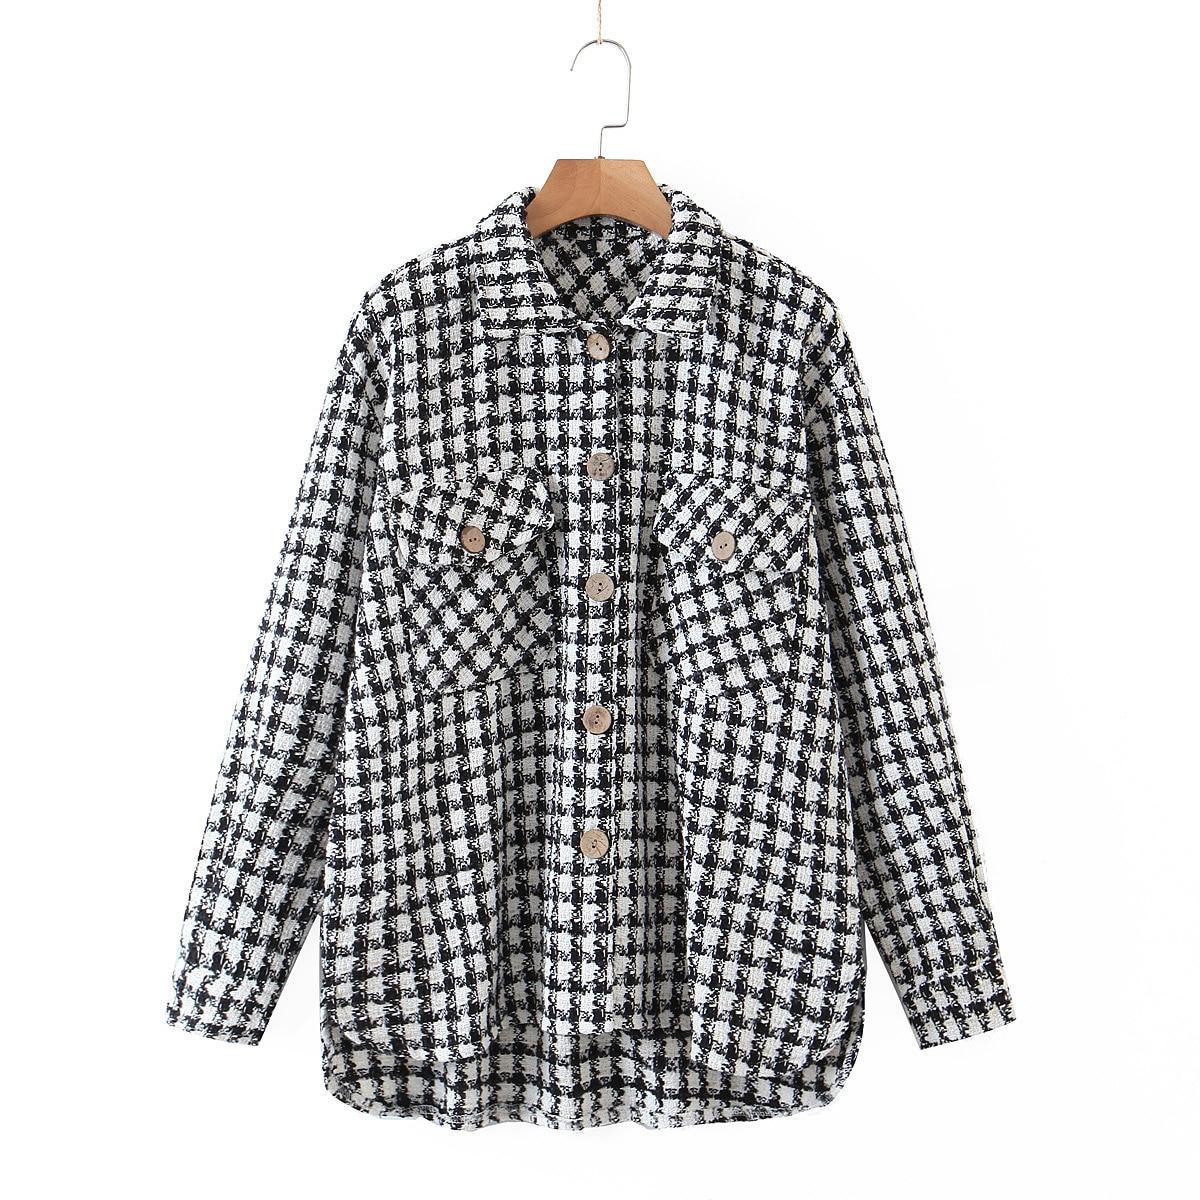 2021 Spring Autumn Jacquard Shirt Coat Women White Black Plaid Single Breasted Casual Slim Female Jackets Coats Ropa Mujer